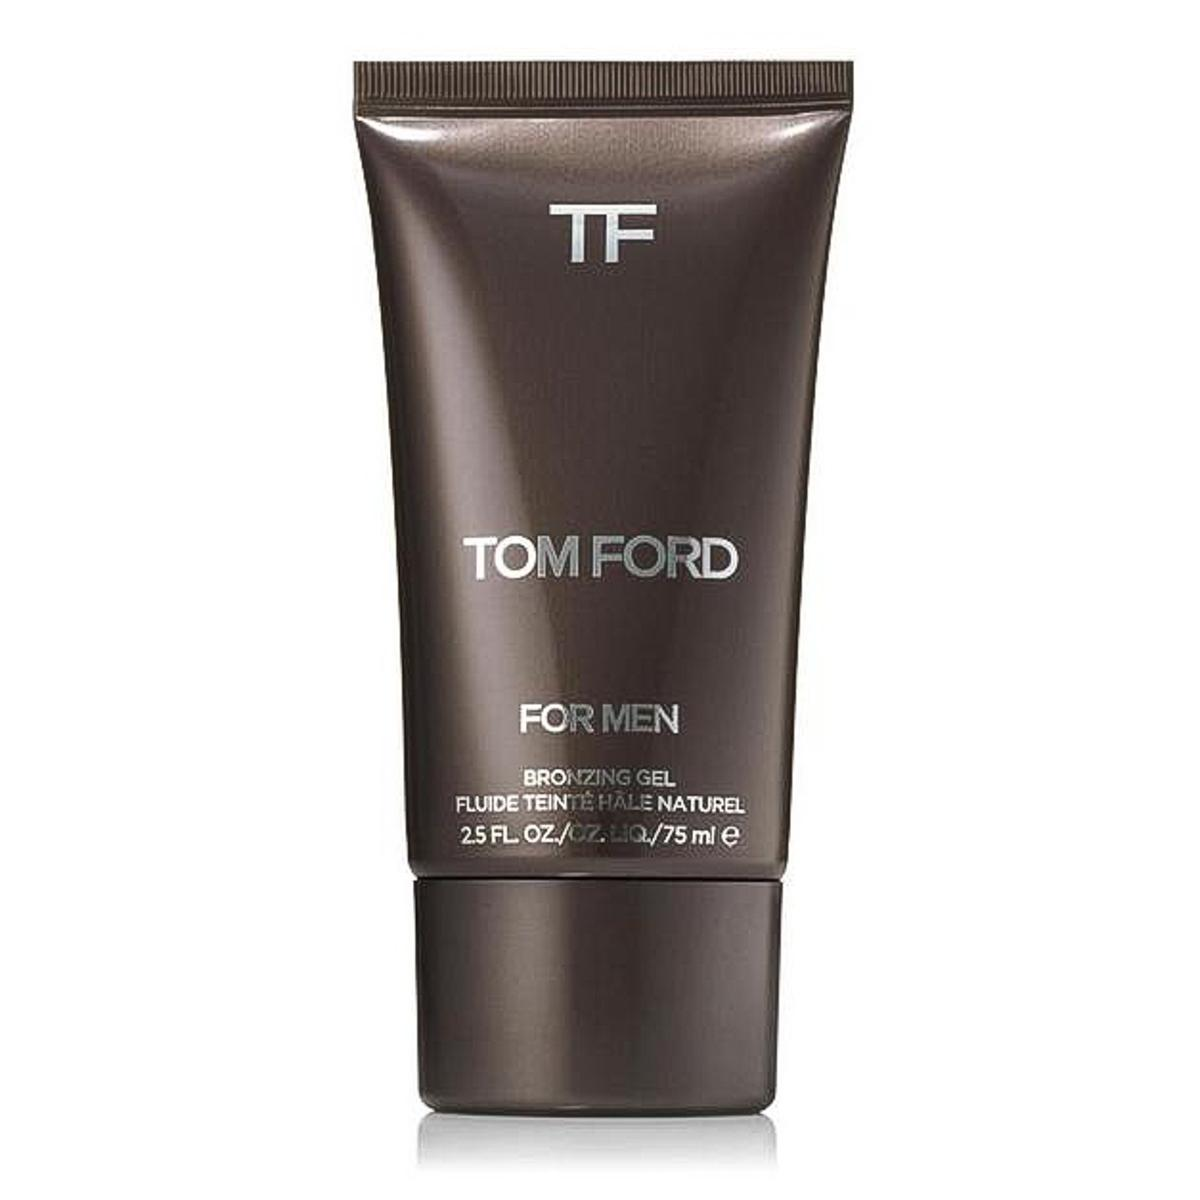 tom-ford-bronzing-gel-review-man-for-himself